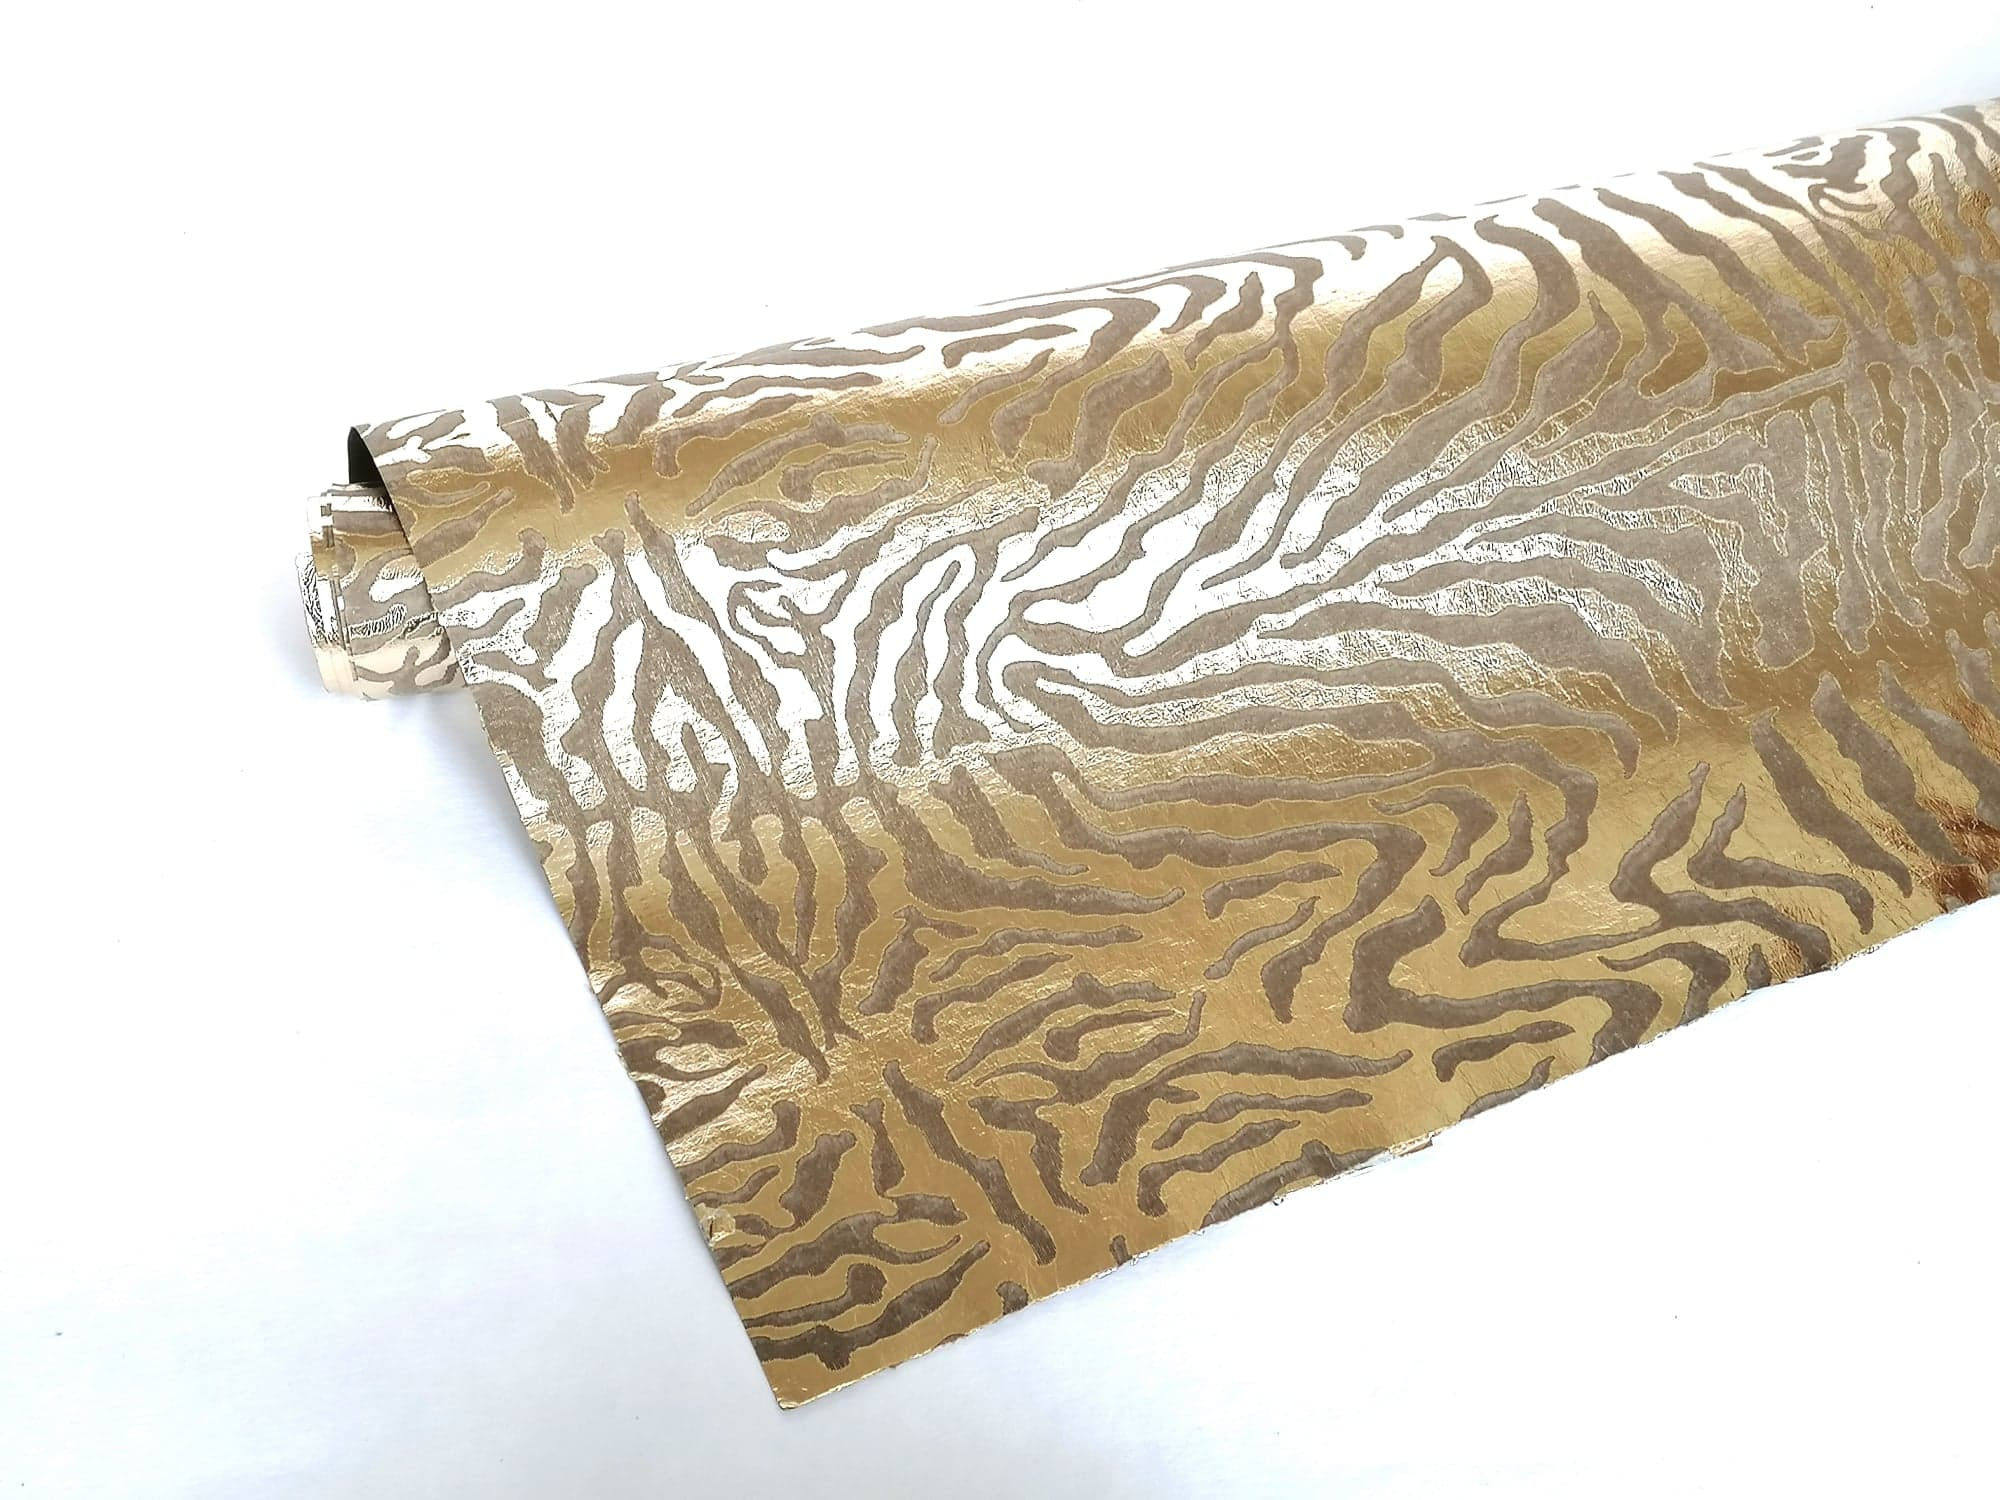 grawerowanie washpapy laserem - blog Alternative Textiles